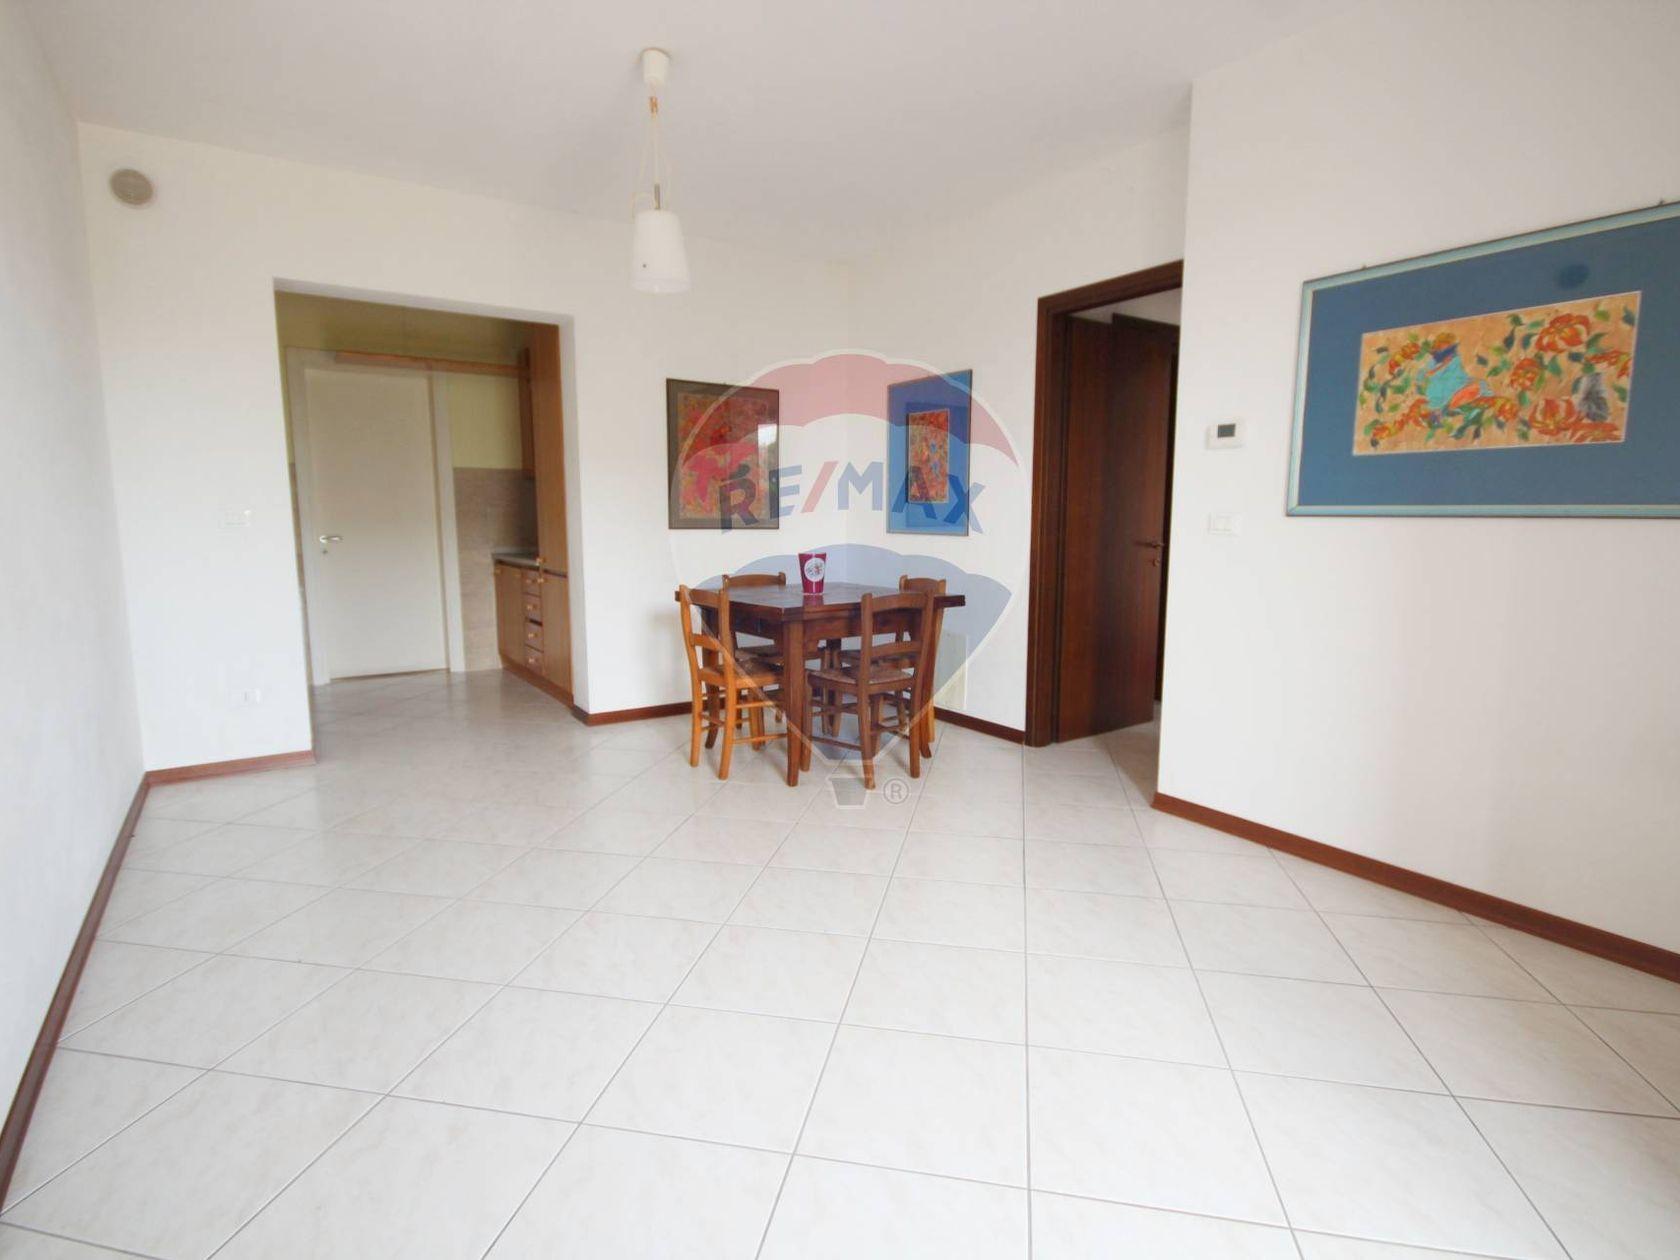 Appartamento Cantarana, Cona, VE Vendita - Foto 5